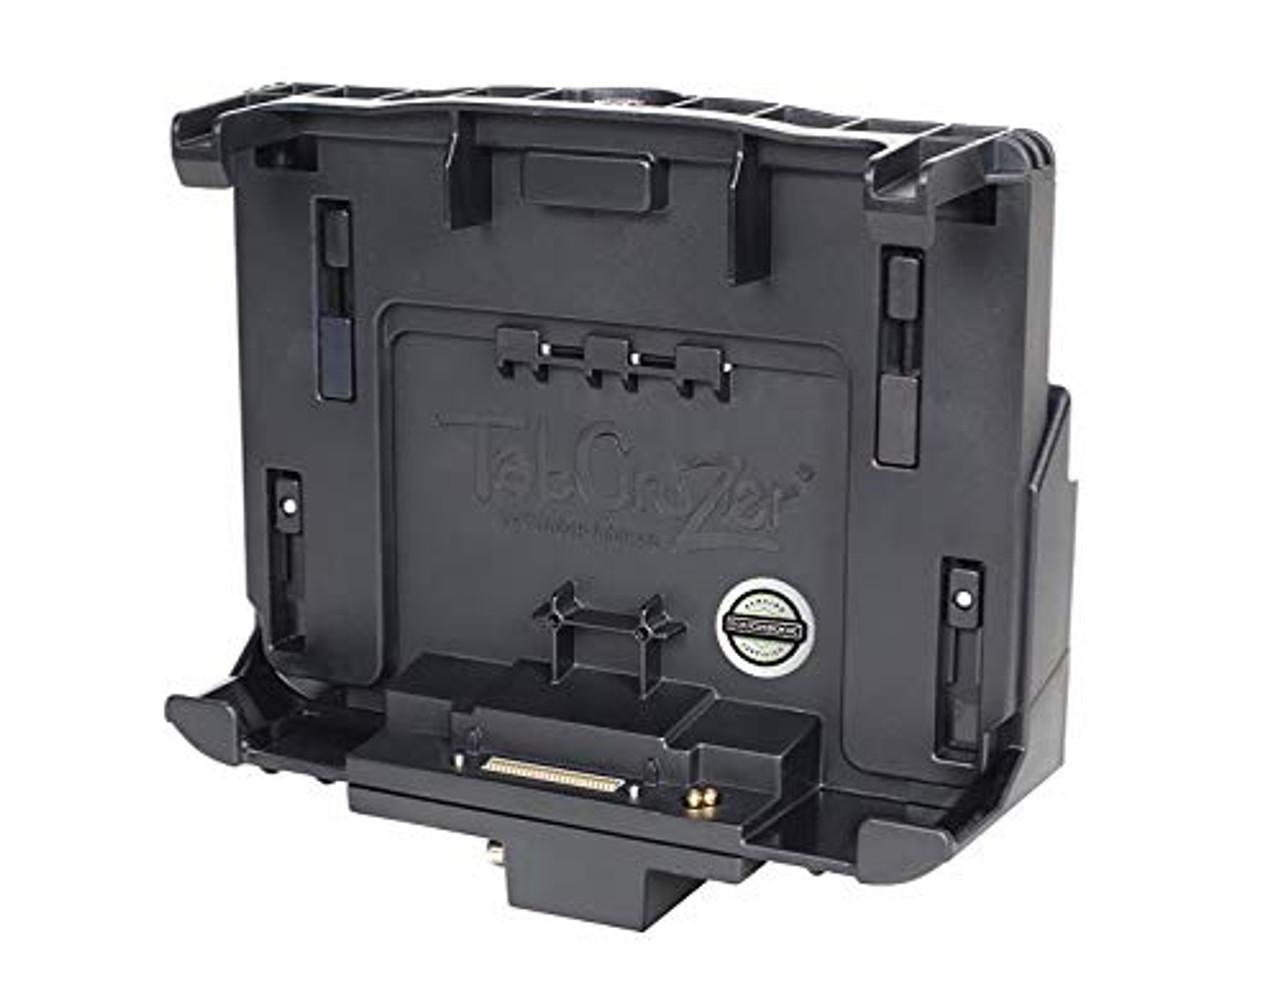 Tabcruze Vehicle Docking Station for the Panasonic Fz-G1 Tablet Computer. Dual R | 0309X8MHYWX